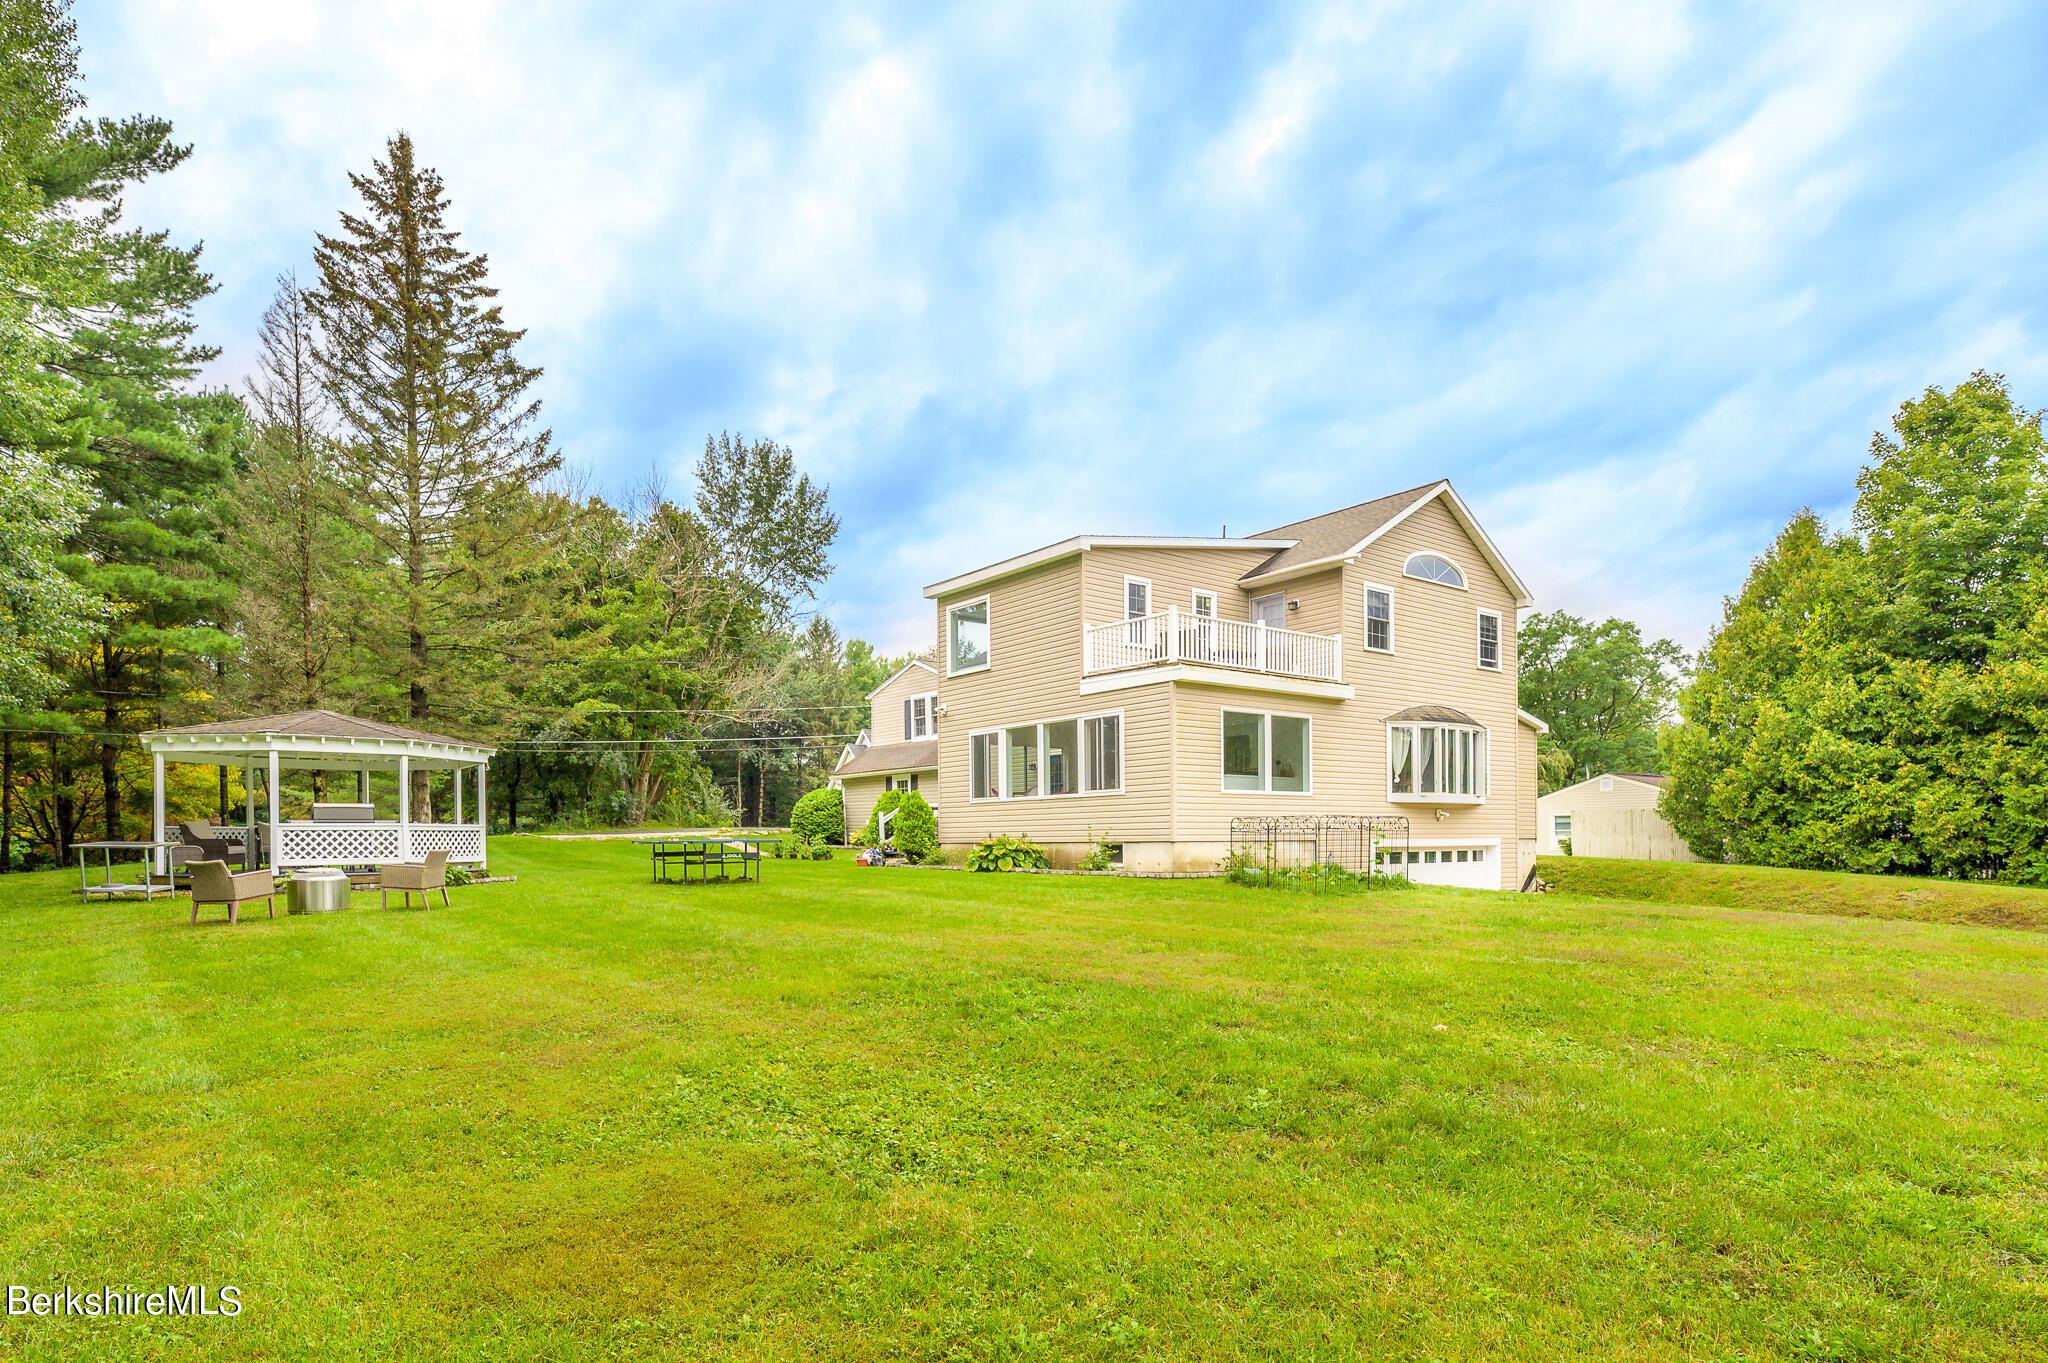 19 Morgan, Lenox, Massachusetts 01240, 4 Bedrooms Bedrooms, 10 Rooms Rooms,3 BathroomsBathrooms,Residential,For Sale,Morgan,235771